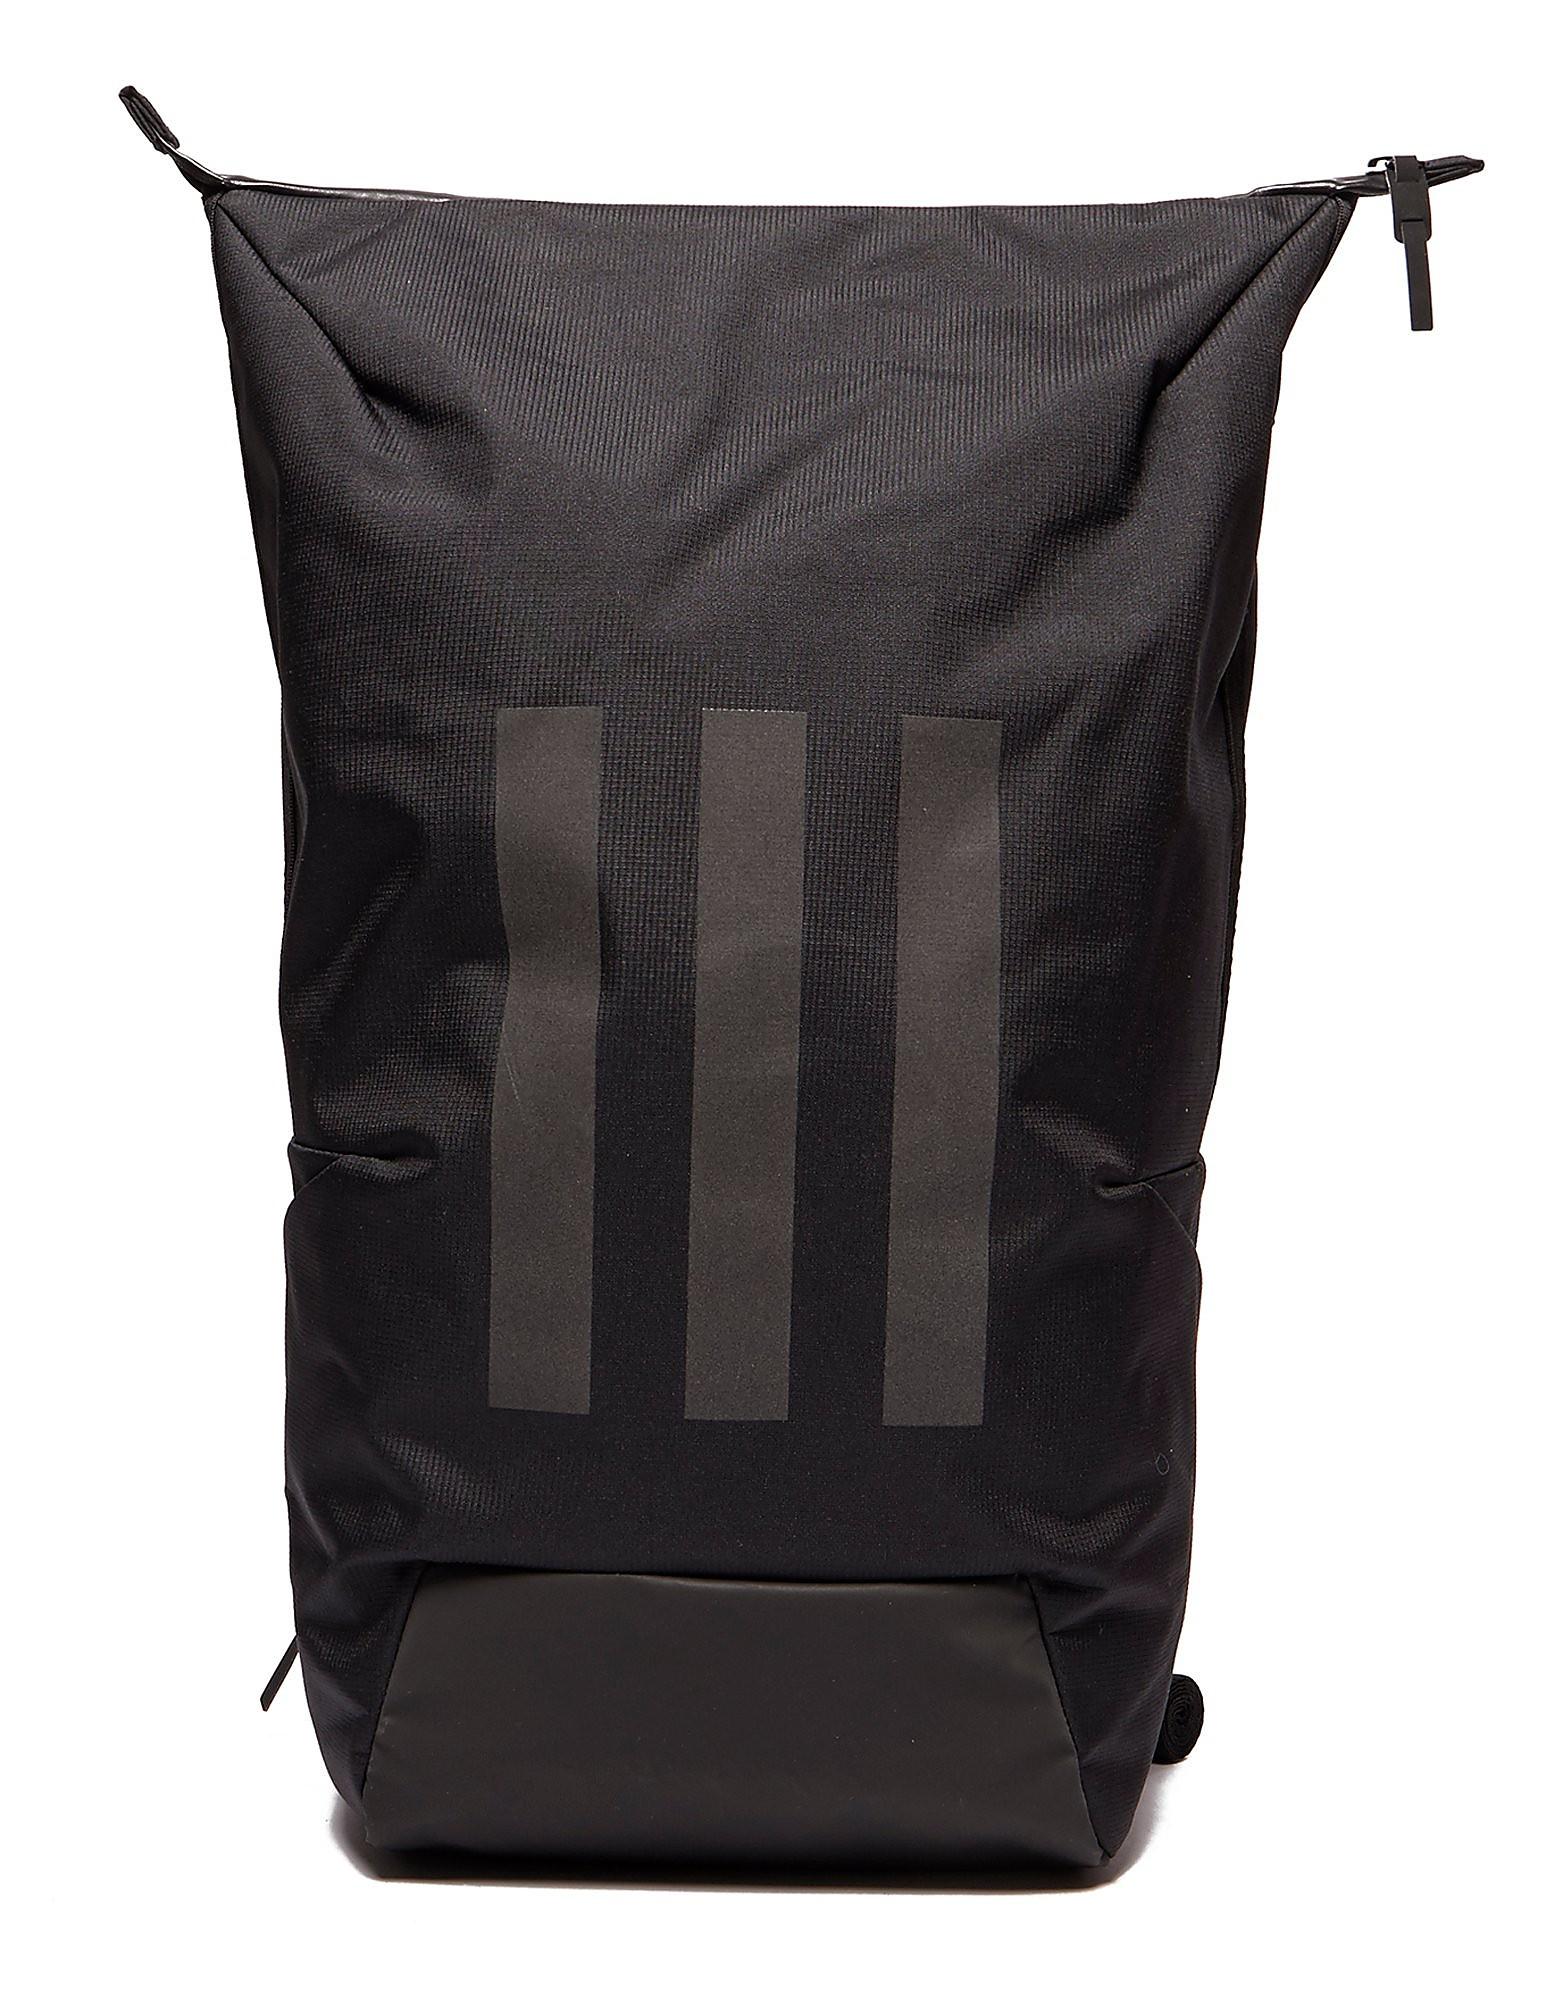 adidas Z.N.E Sideline Backpack